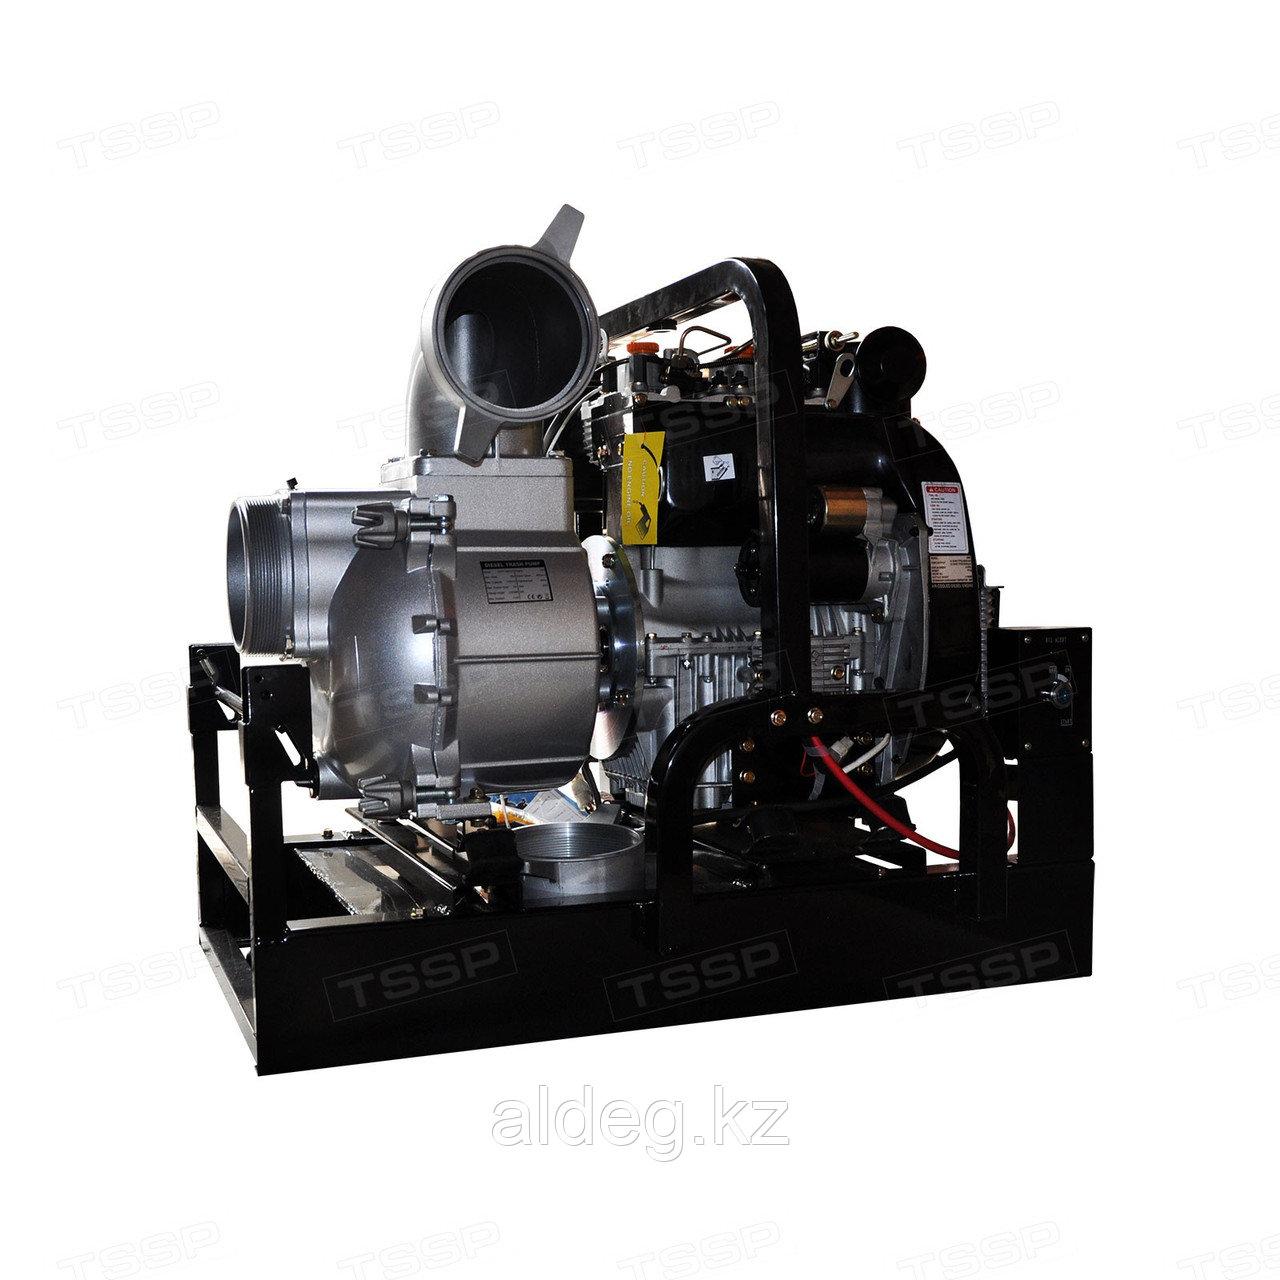 Мотопомпа дизельная WP150 ALTECO